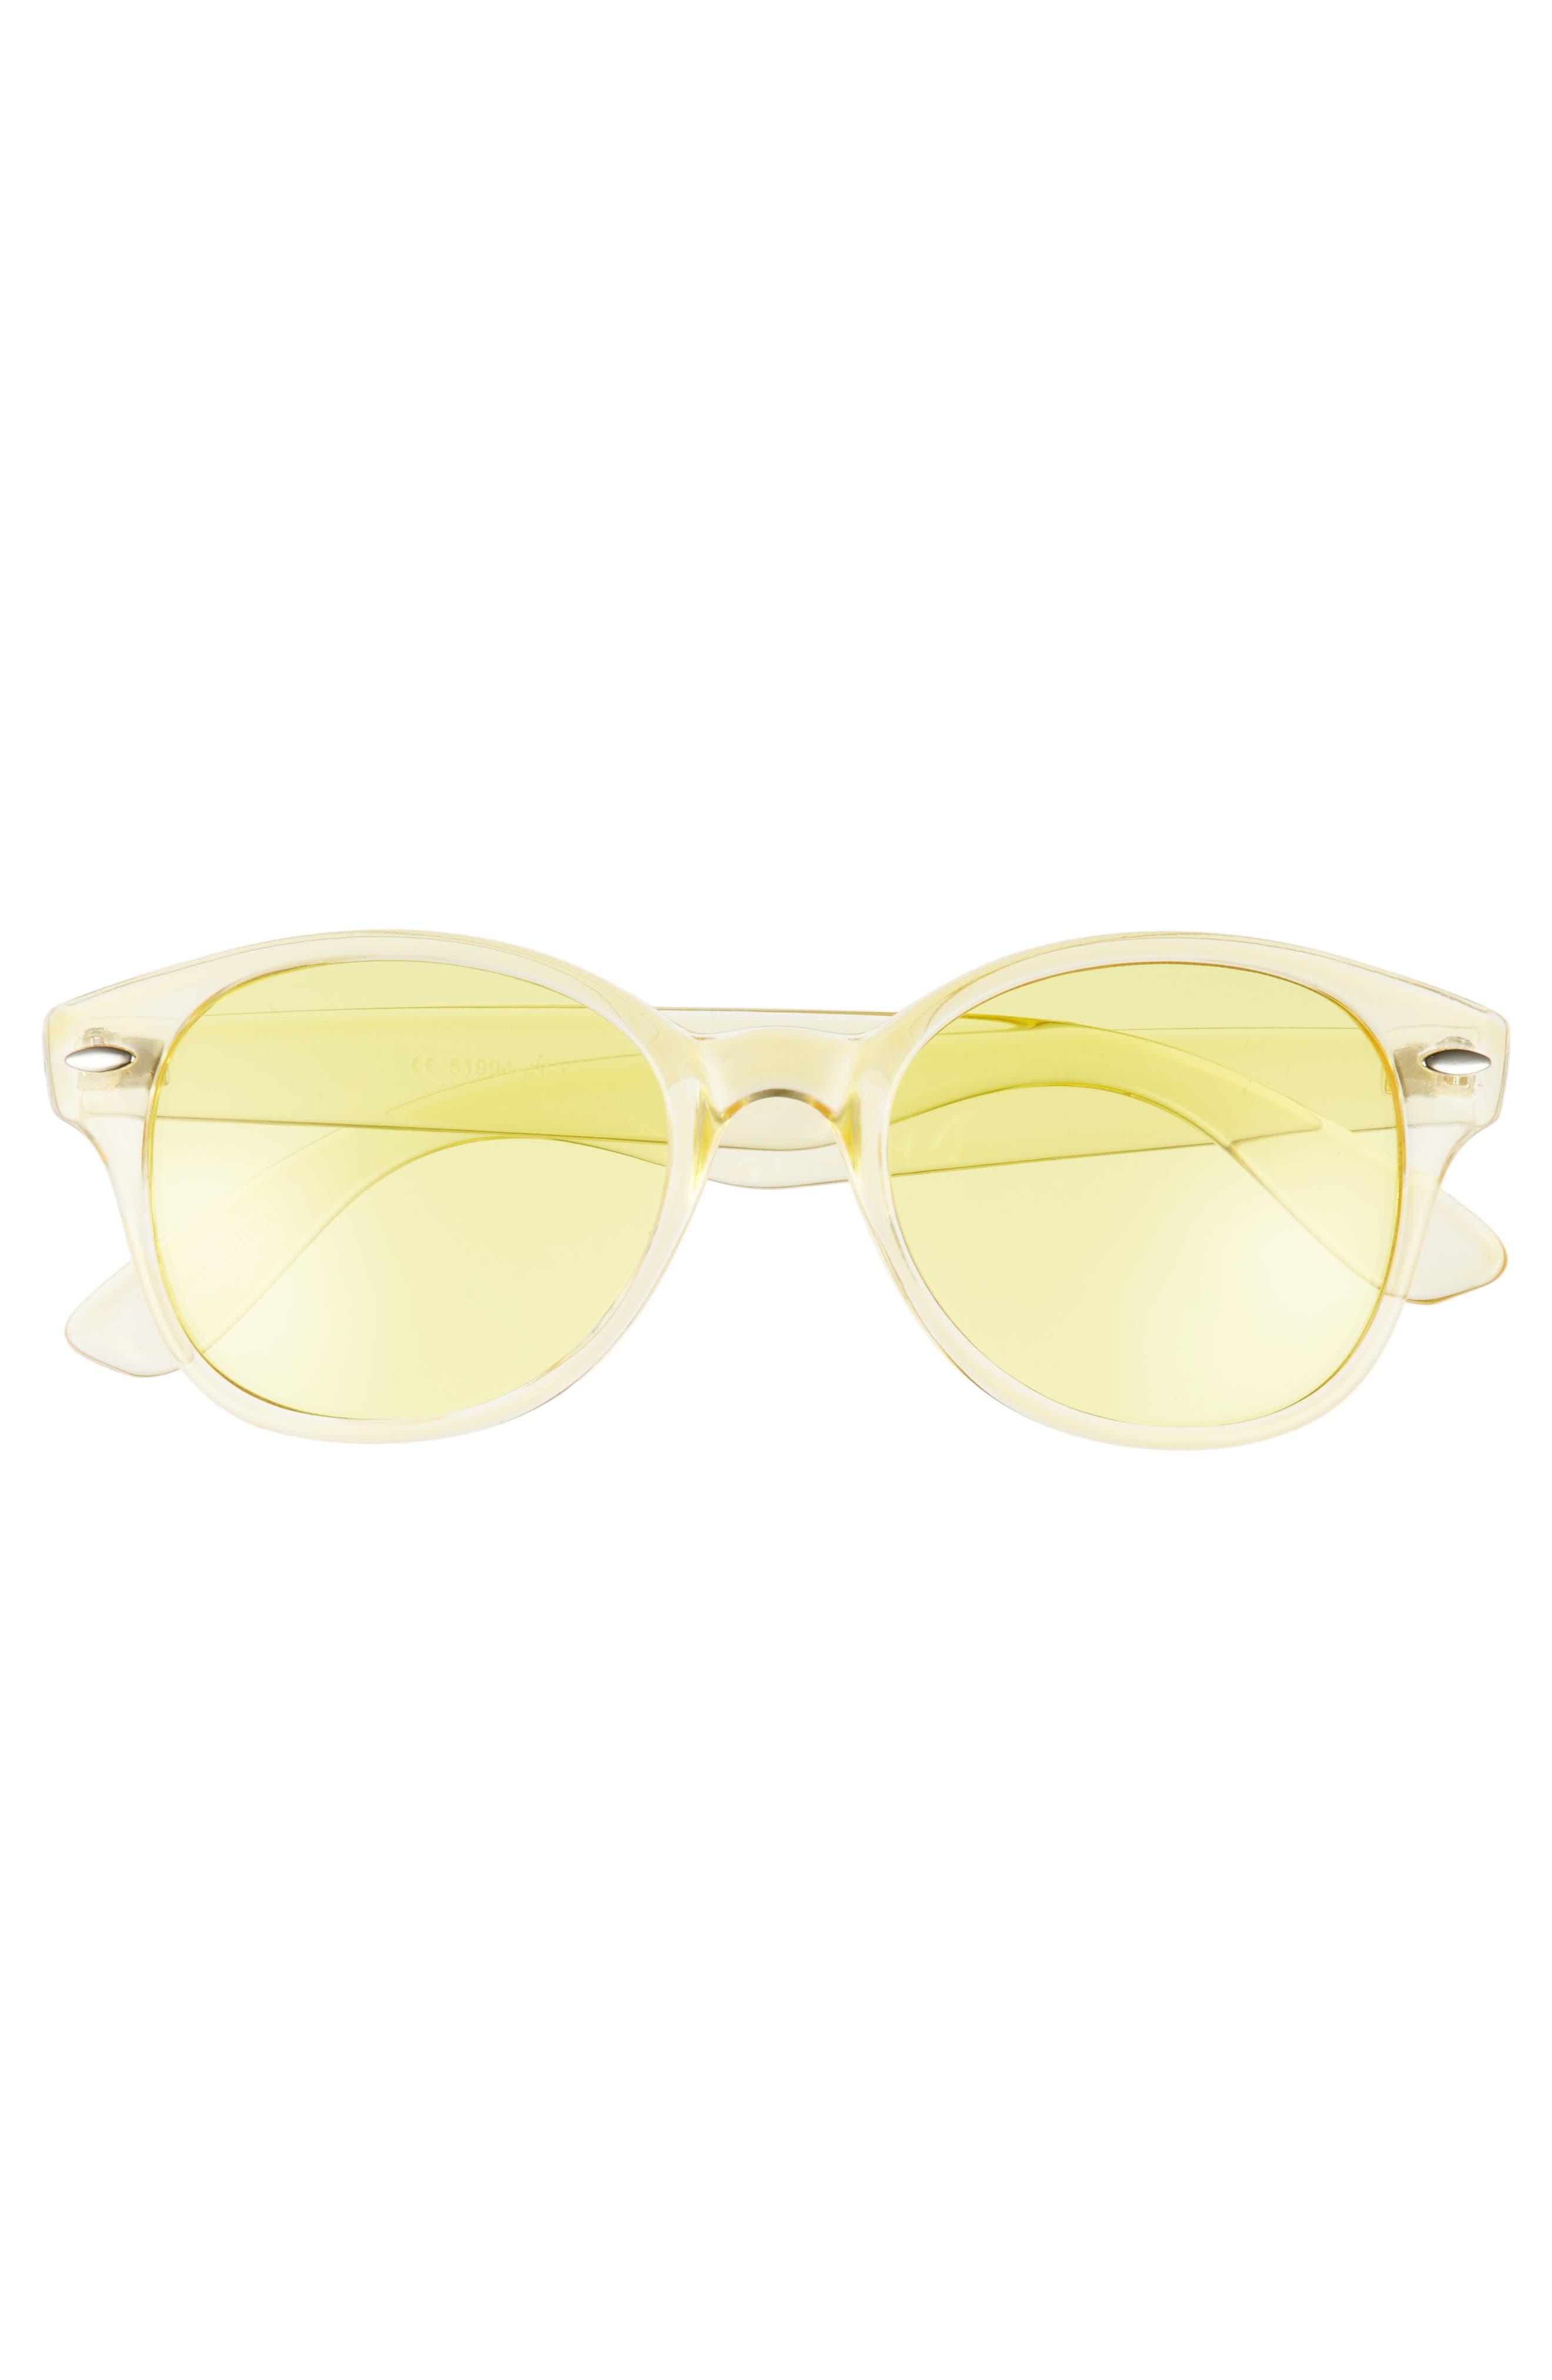 50mm Transparent Round Sunglasses,                             Alternate thumbnail 3, color,                             Yellow